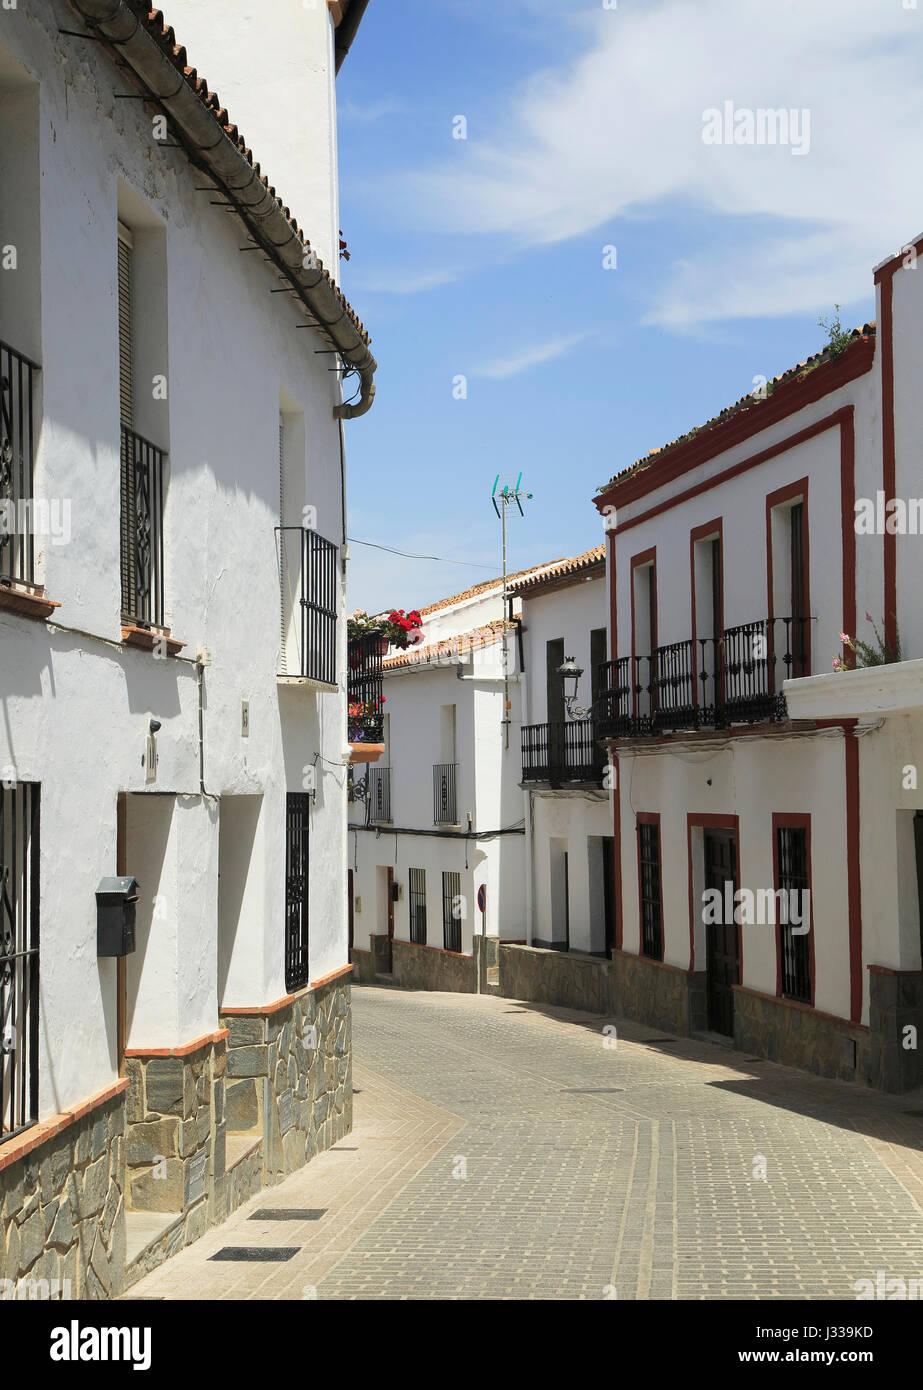 Whitewashed buildings narrow street, Montejaque, Serrania de Ronda, Malaga province, Spain - Stock Image